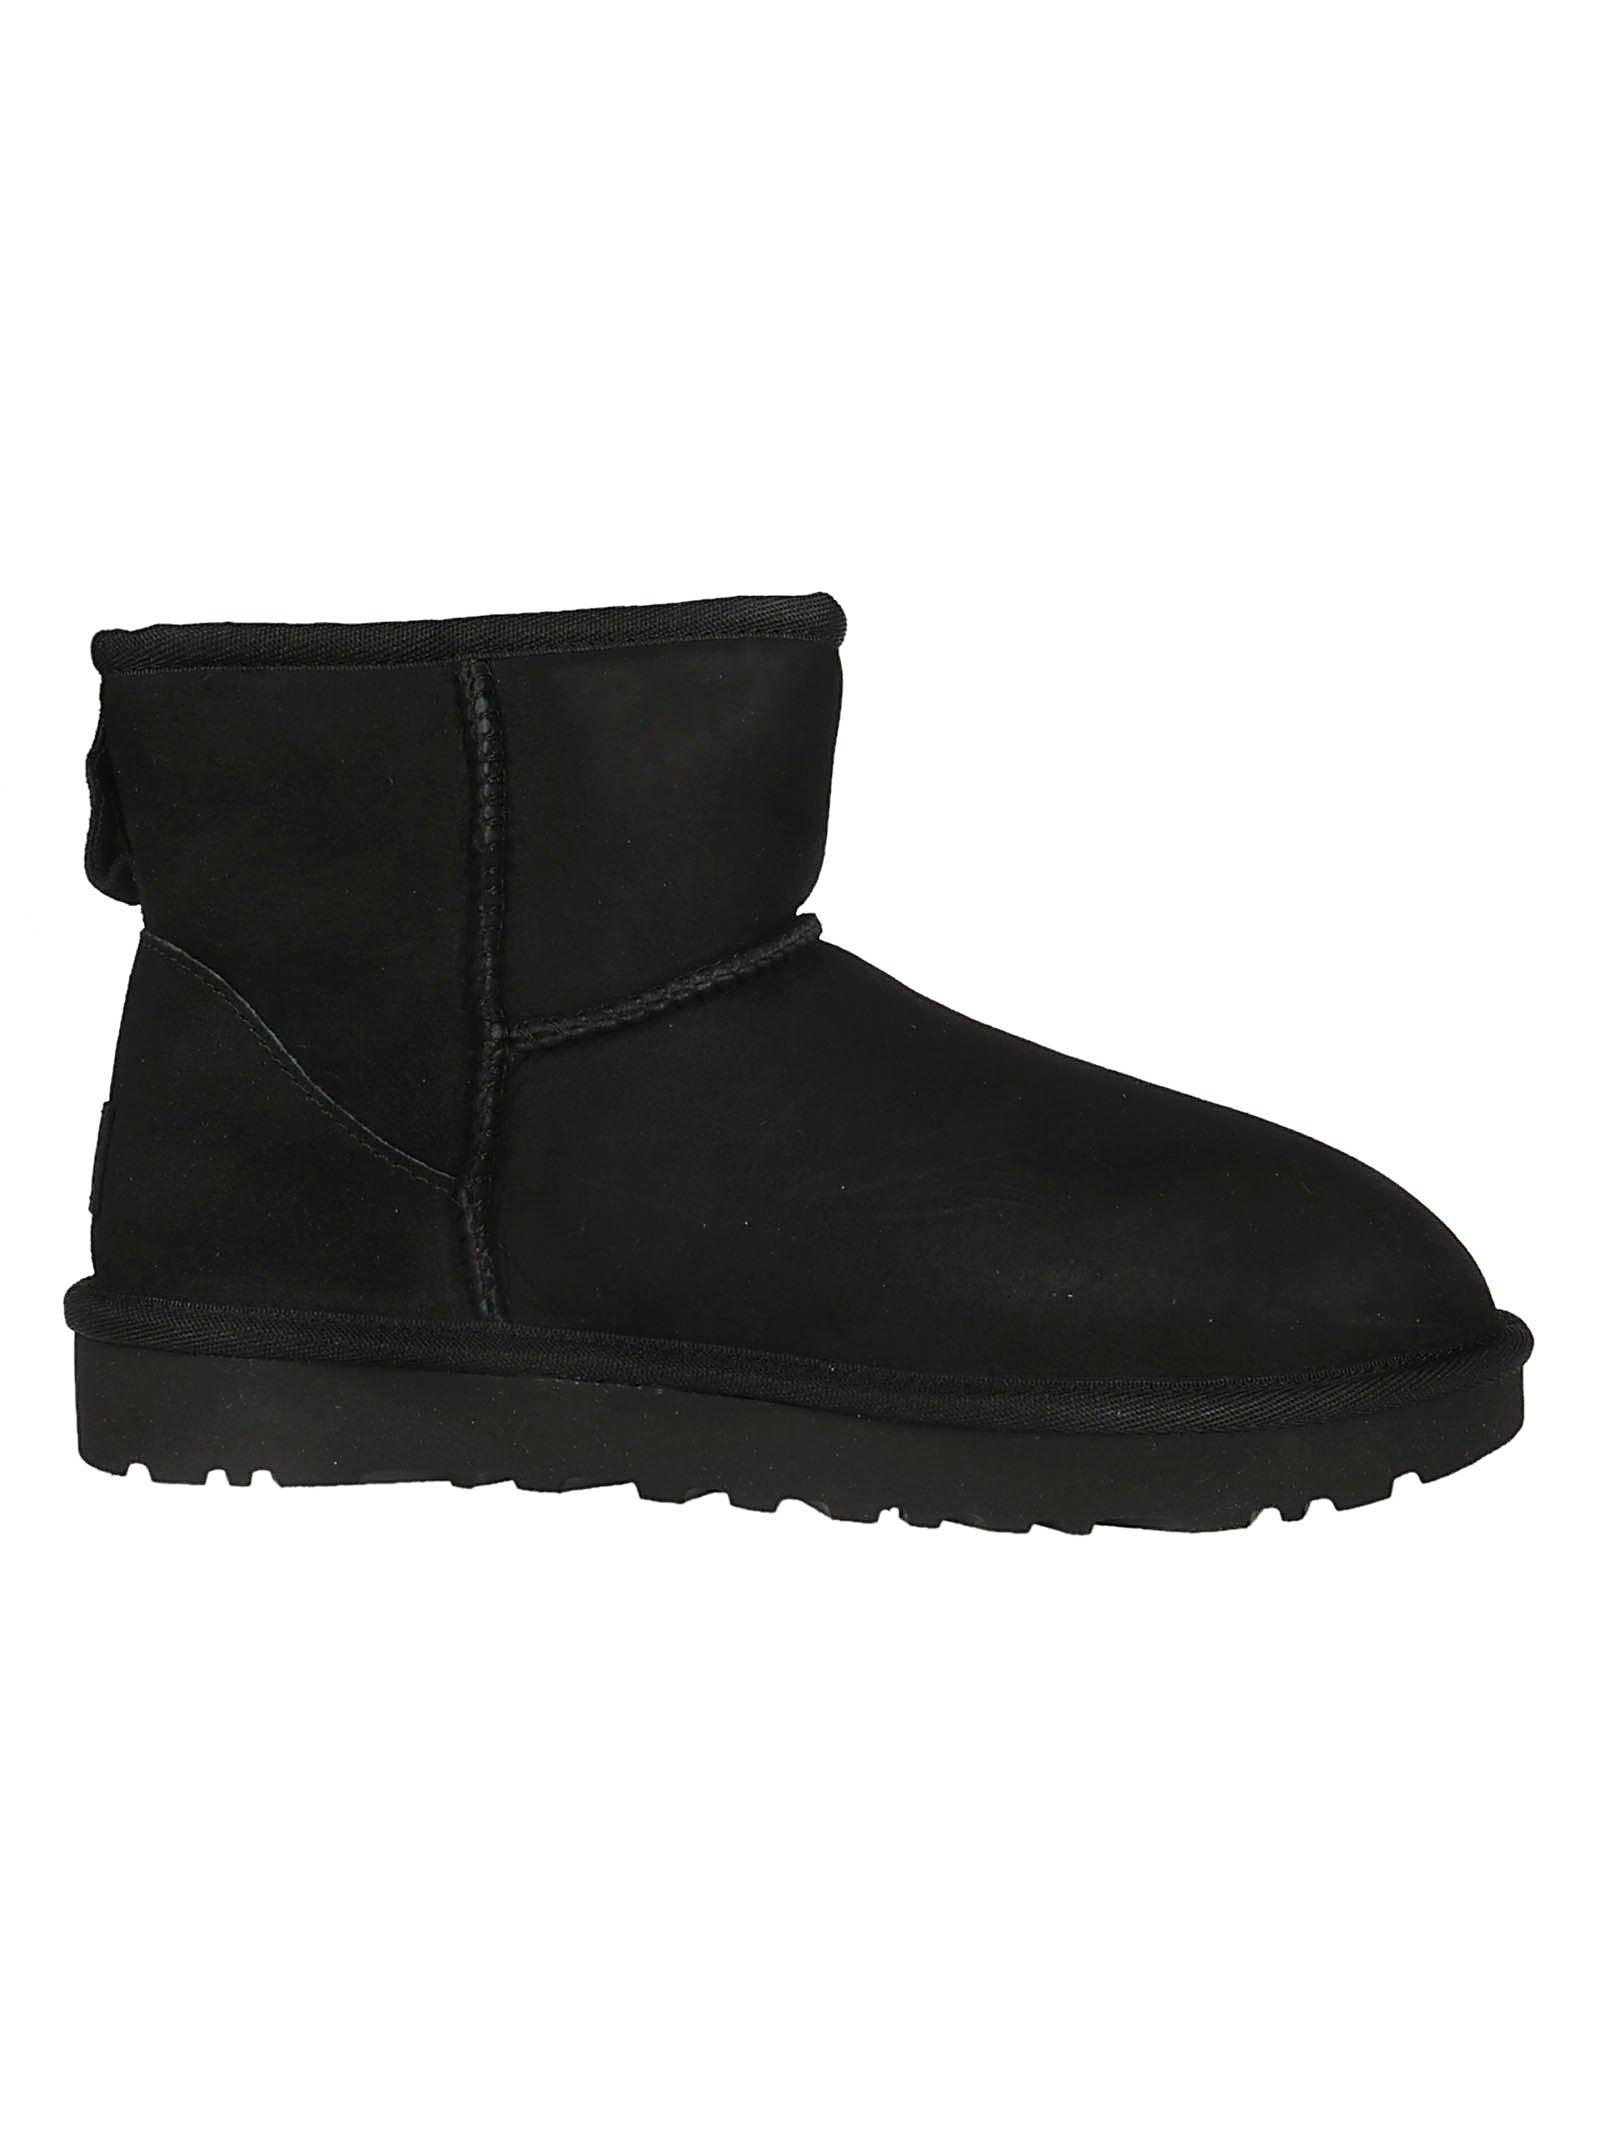 Ugg Australia Classic Ii Mini Ankle Boots